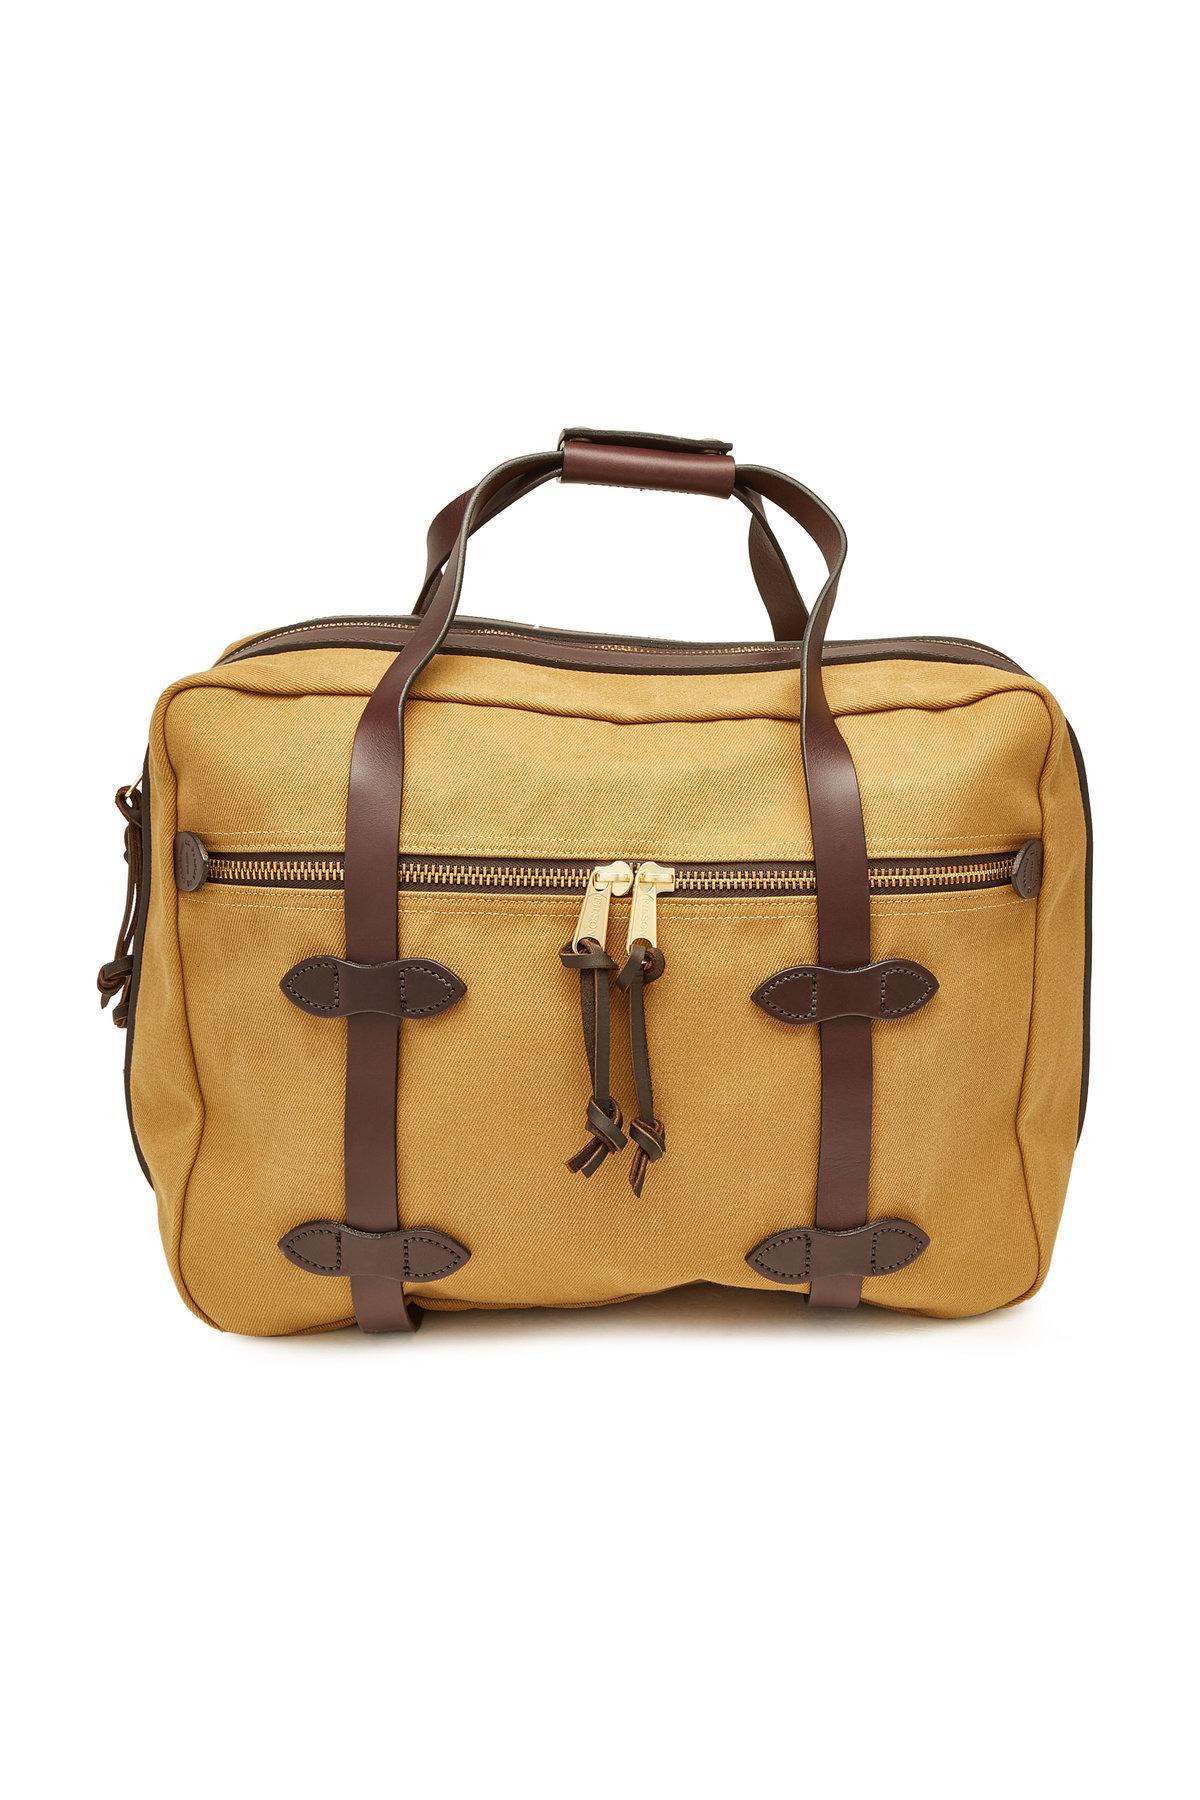 Filson Pullman Small Travel Bag for Men - Lyst 85354c24ccf10